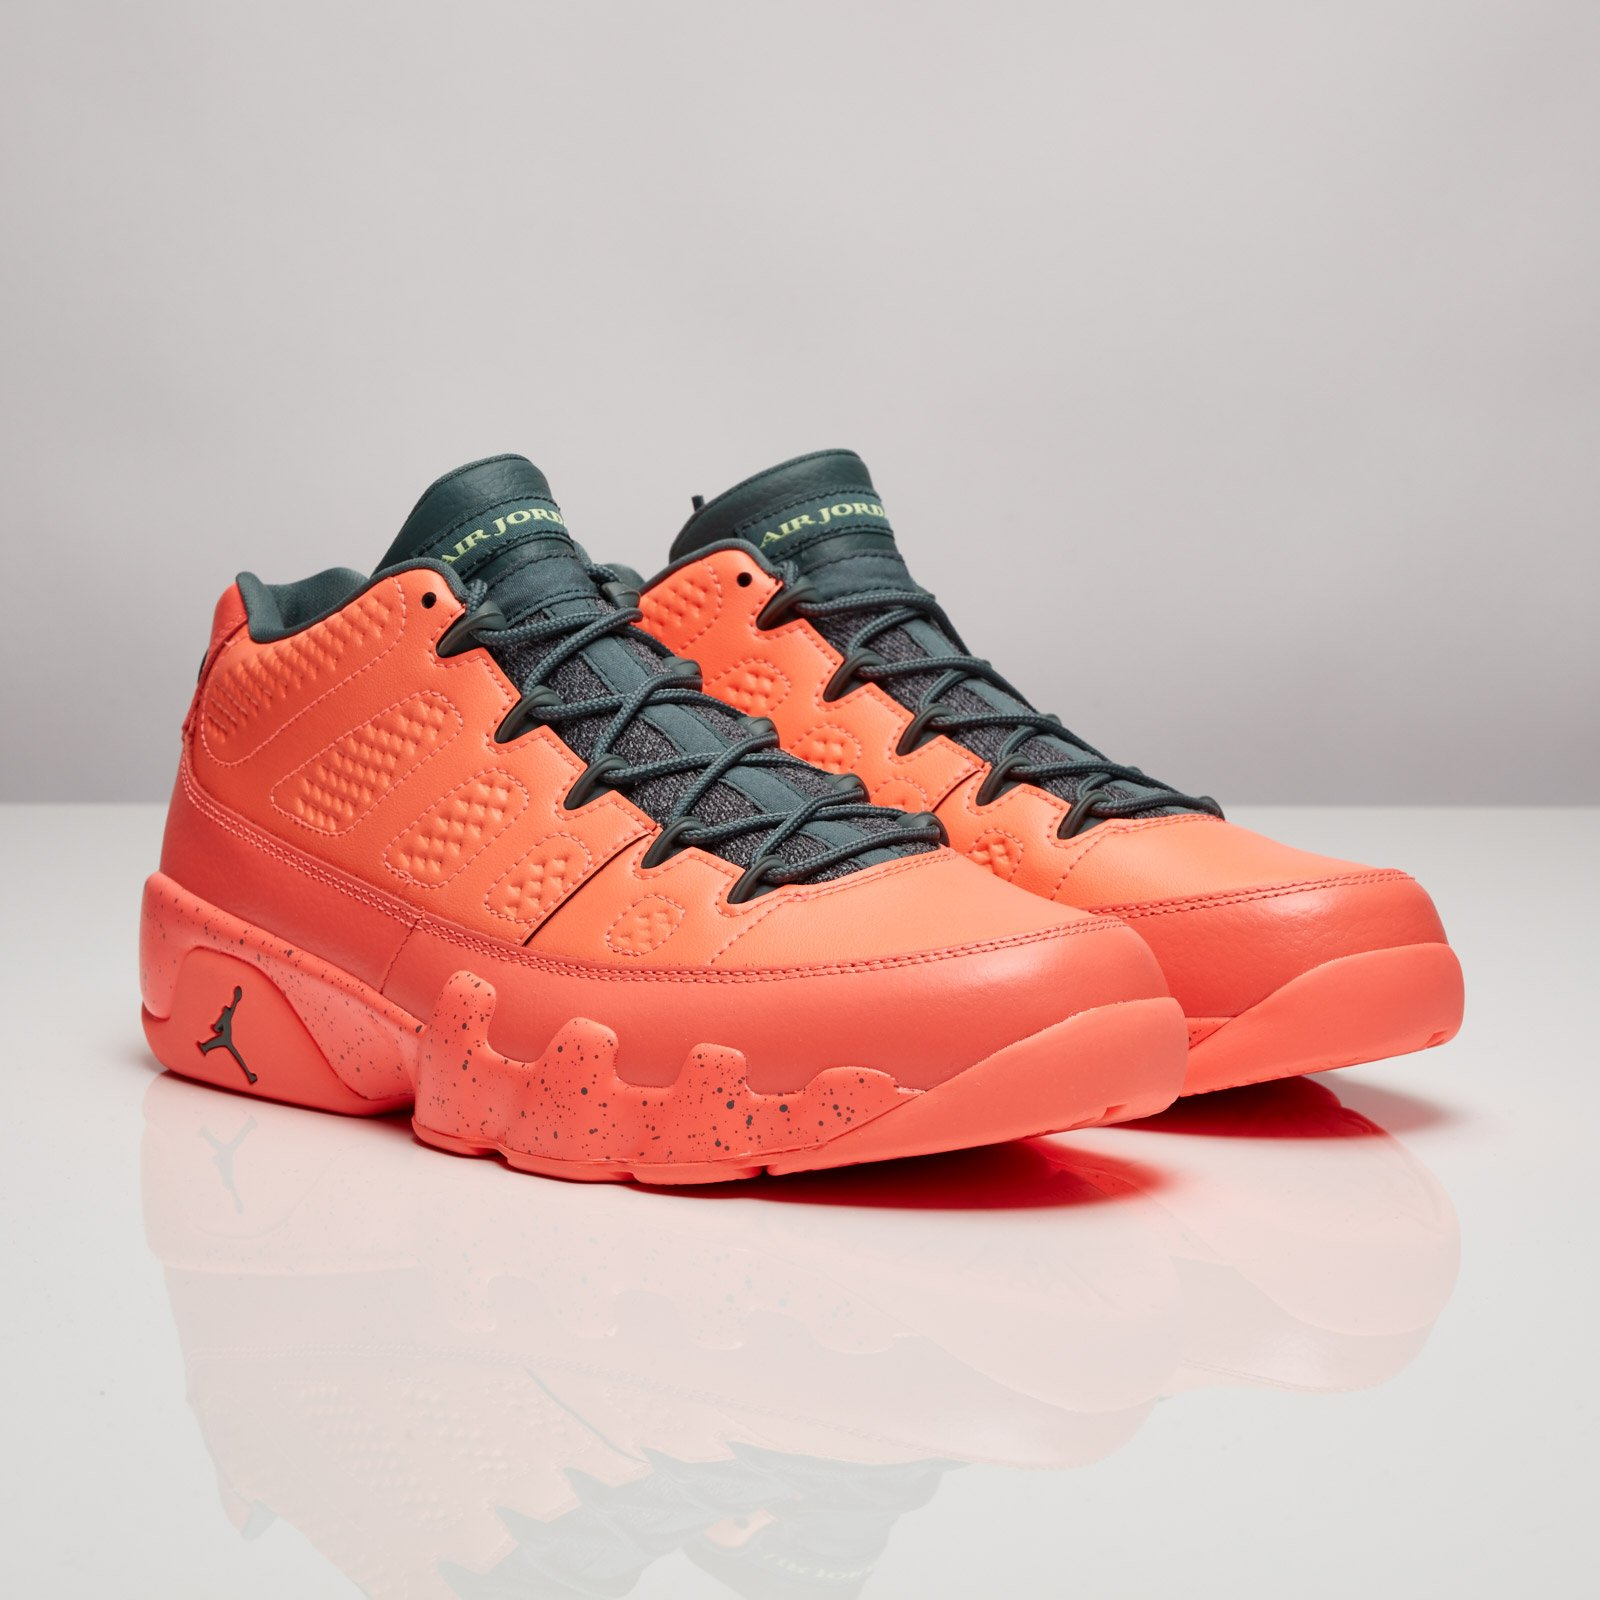 96f60563267439 discount code for orange green mens air jordan retro 9 shoes 18771 4bb5b